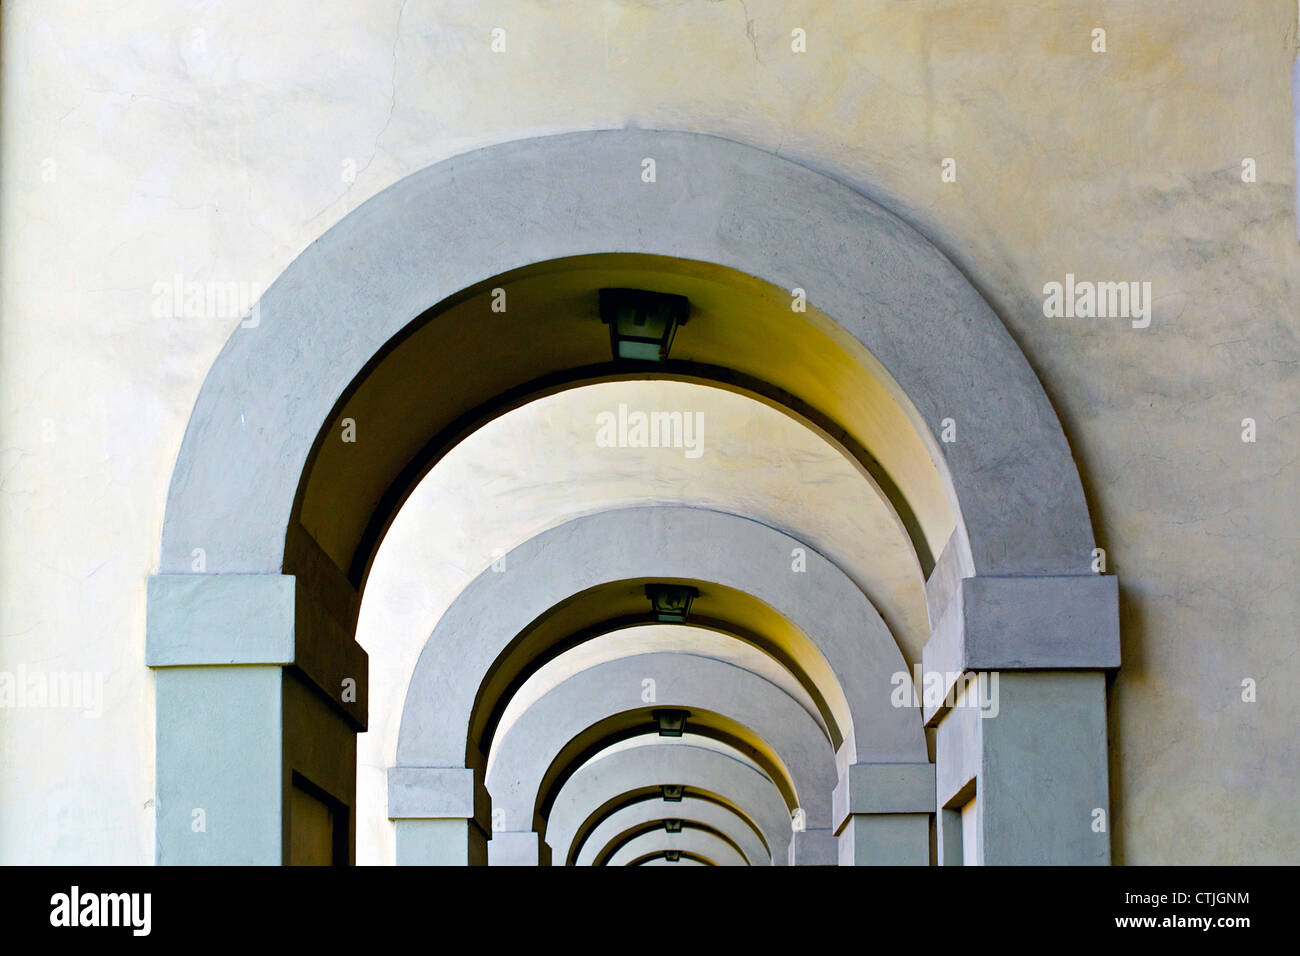 Reihe von konkreten Bögen in Italien Florance Stockbild